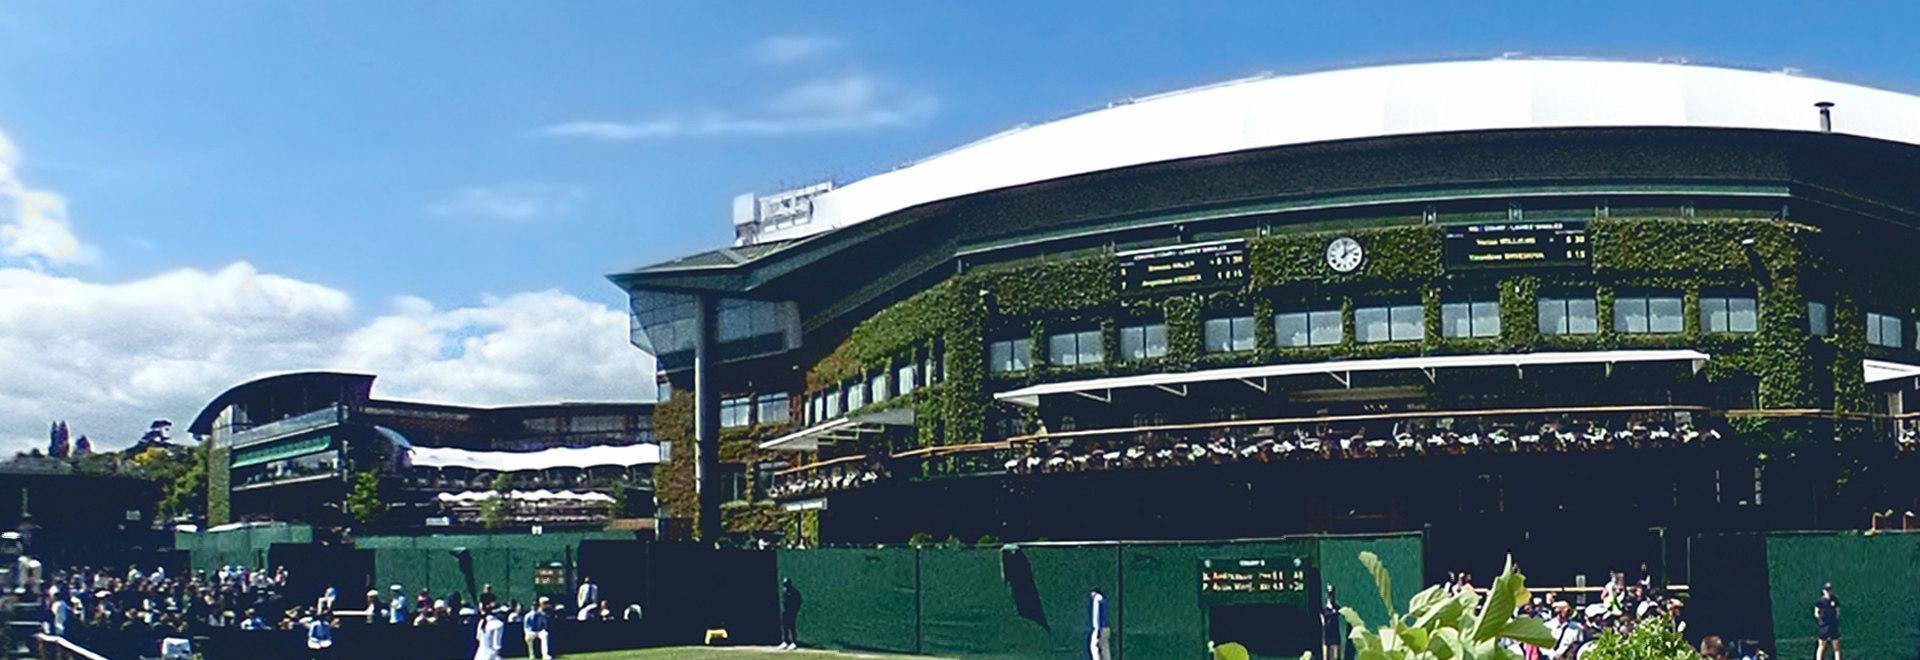 Wimbledon 1999: Sampras - Agassi. Finale